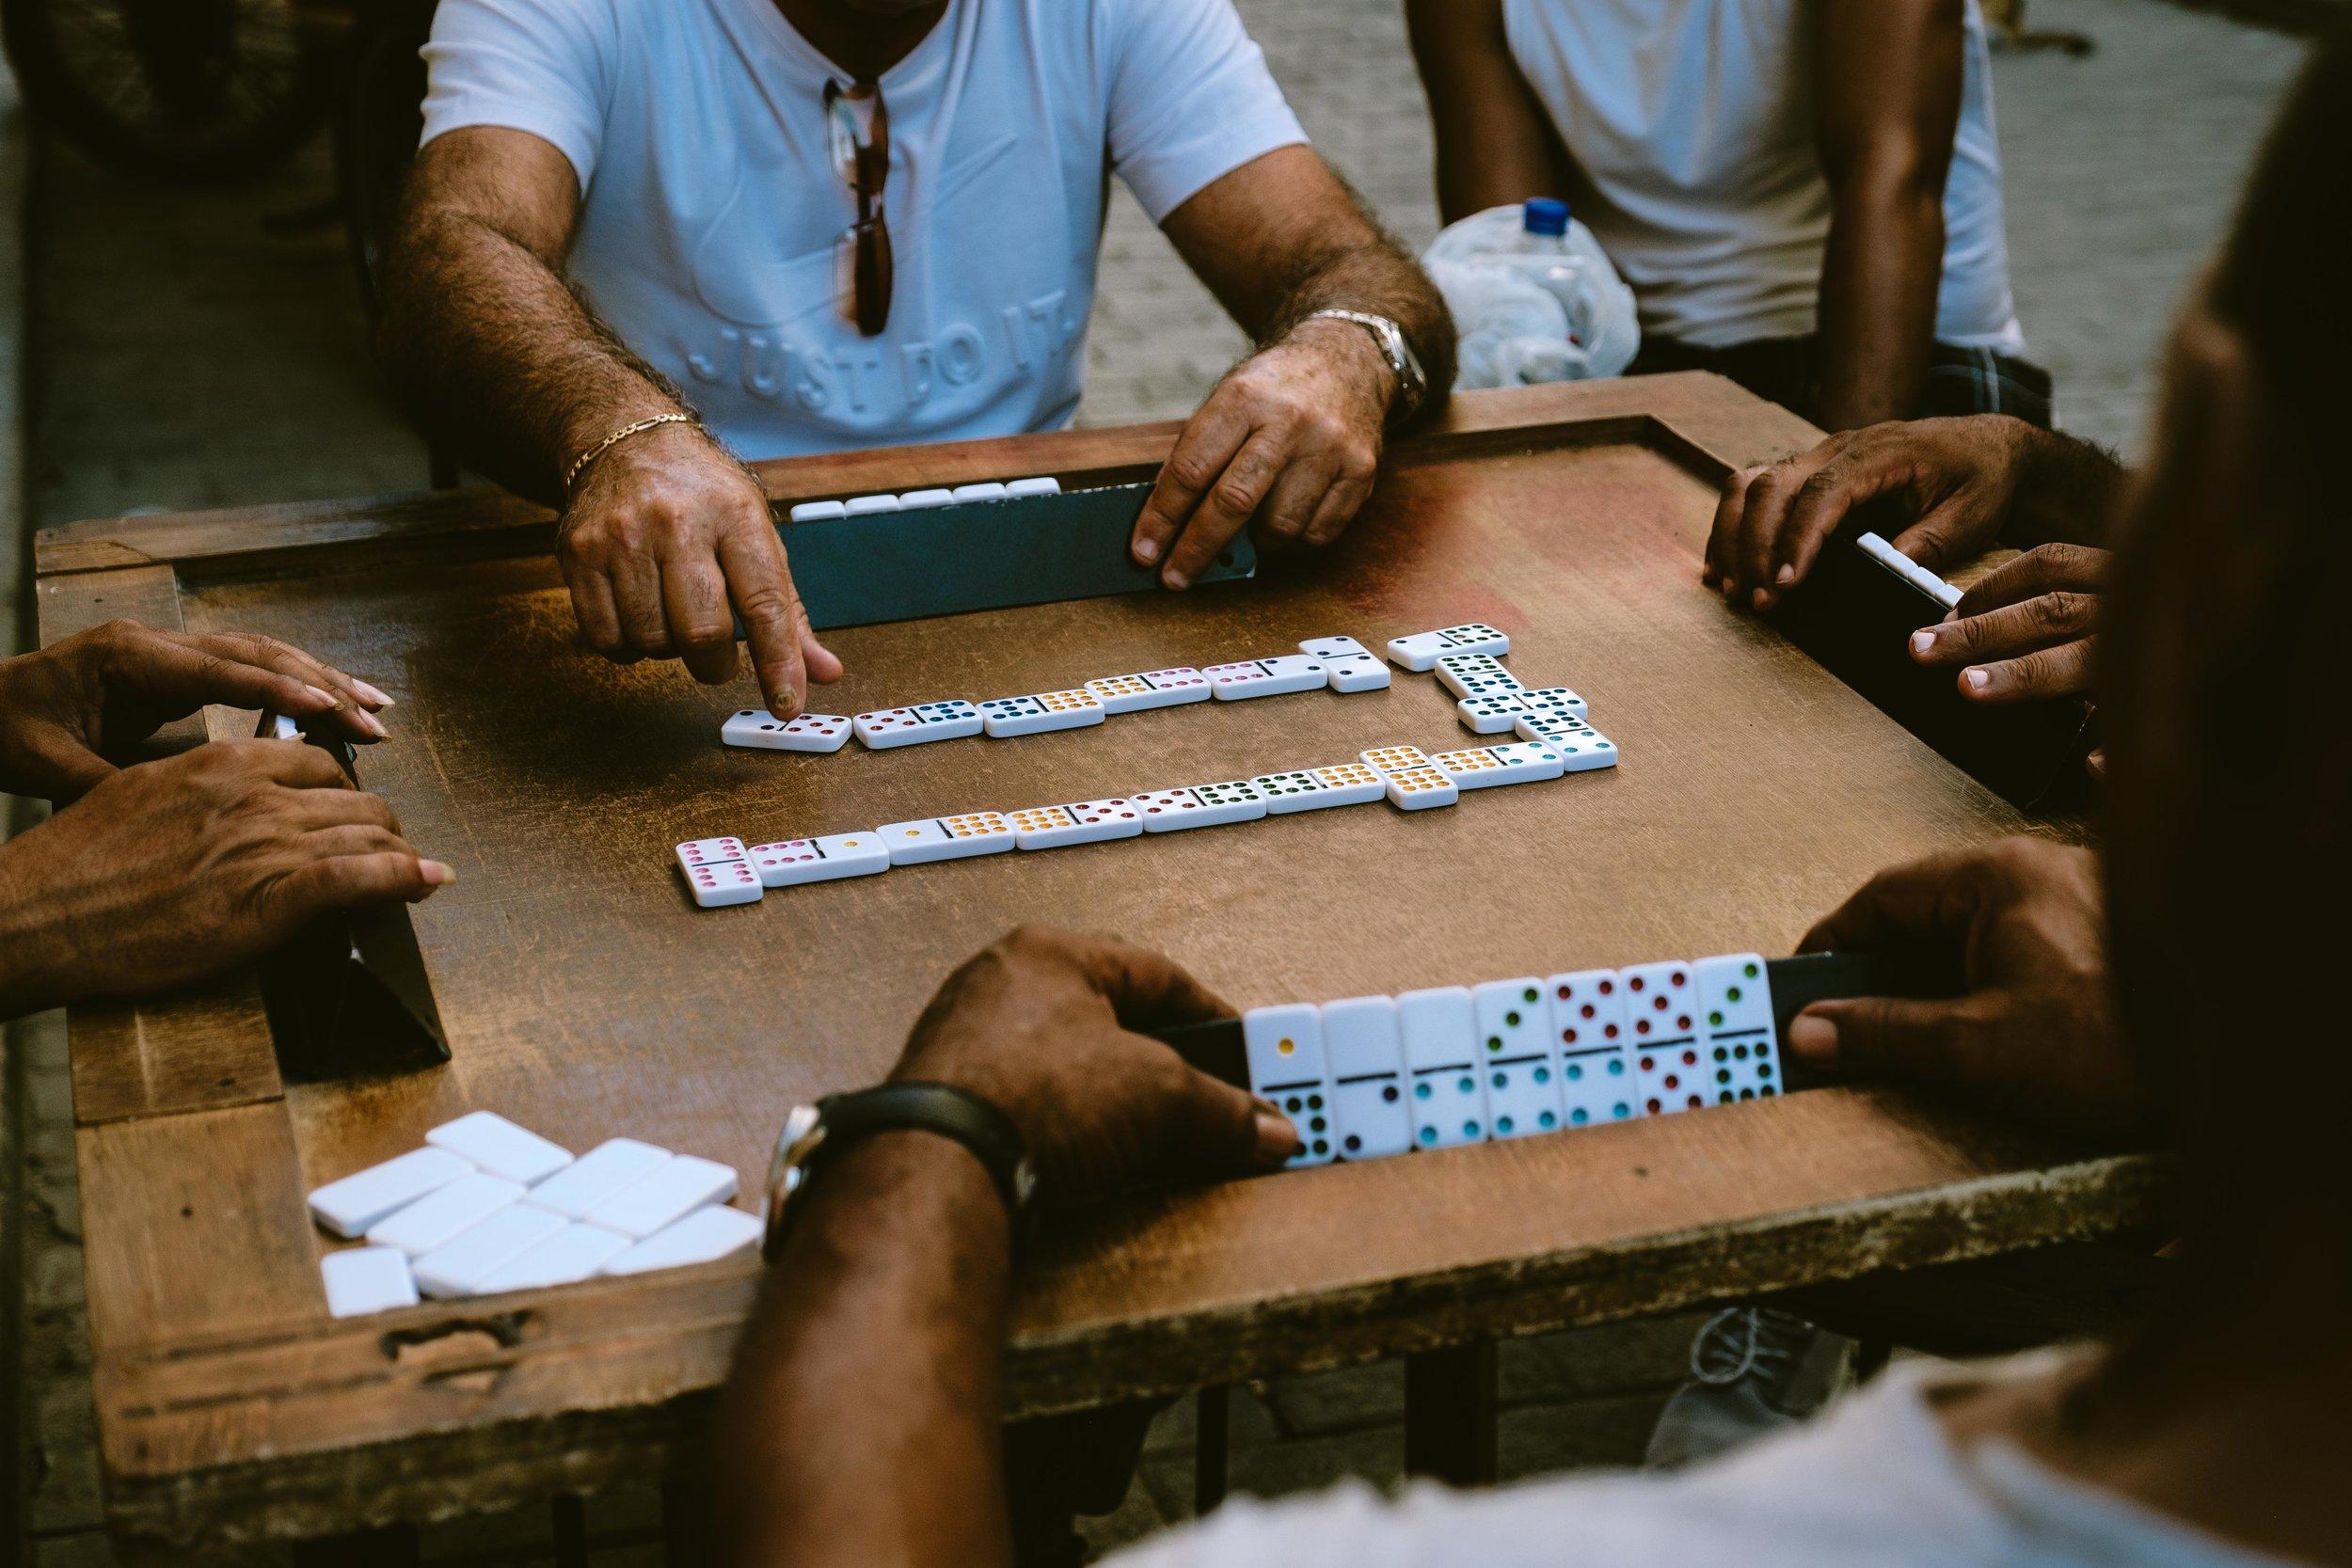 Cookwilltravel - Cuba - DSCF8918.jpg